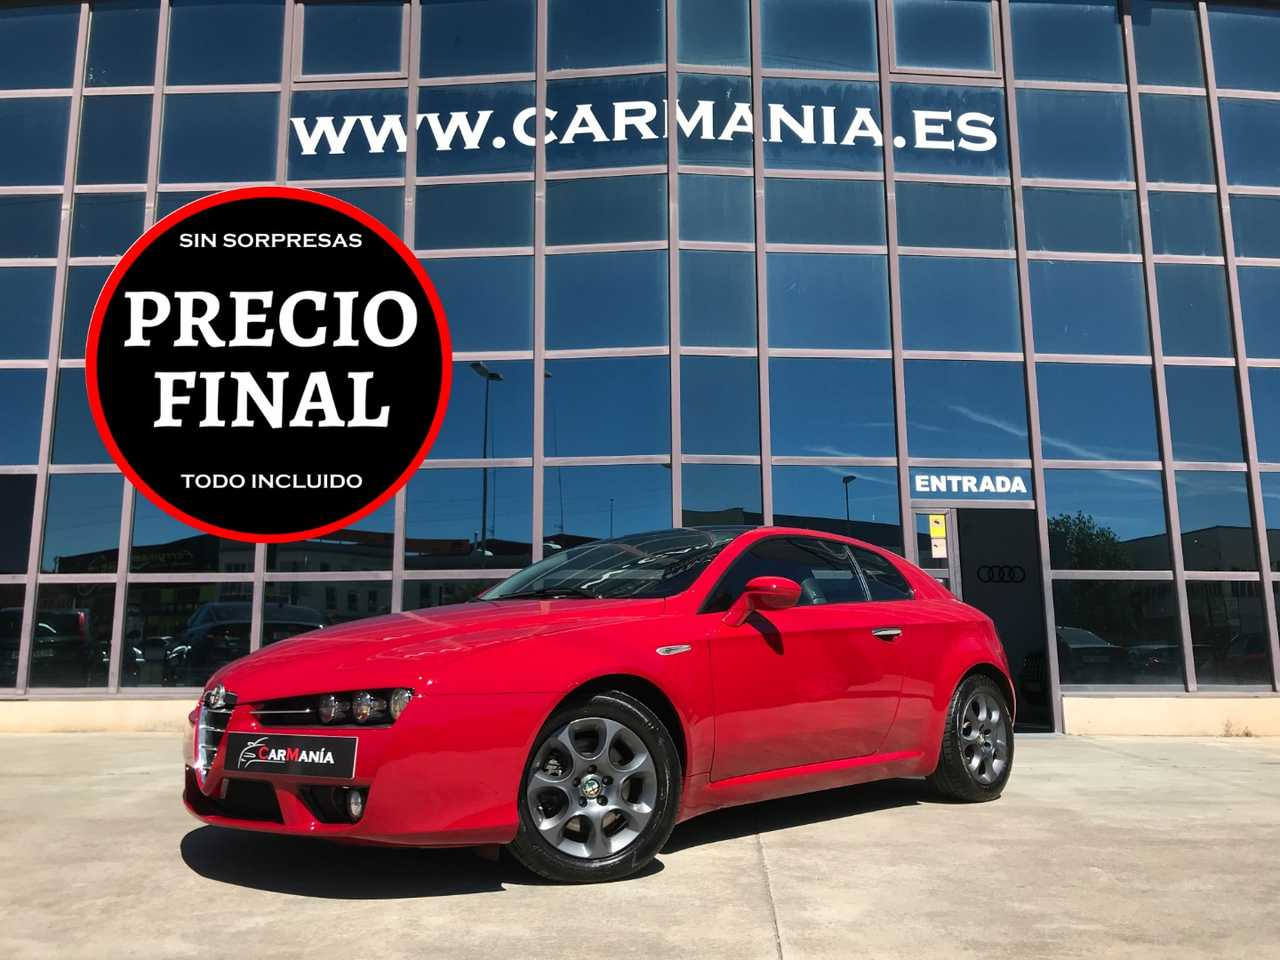 Alfa Romeo Brera 2.2 JTS DISTINCTIVE  - Foto 1